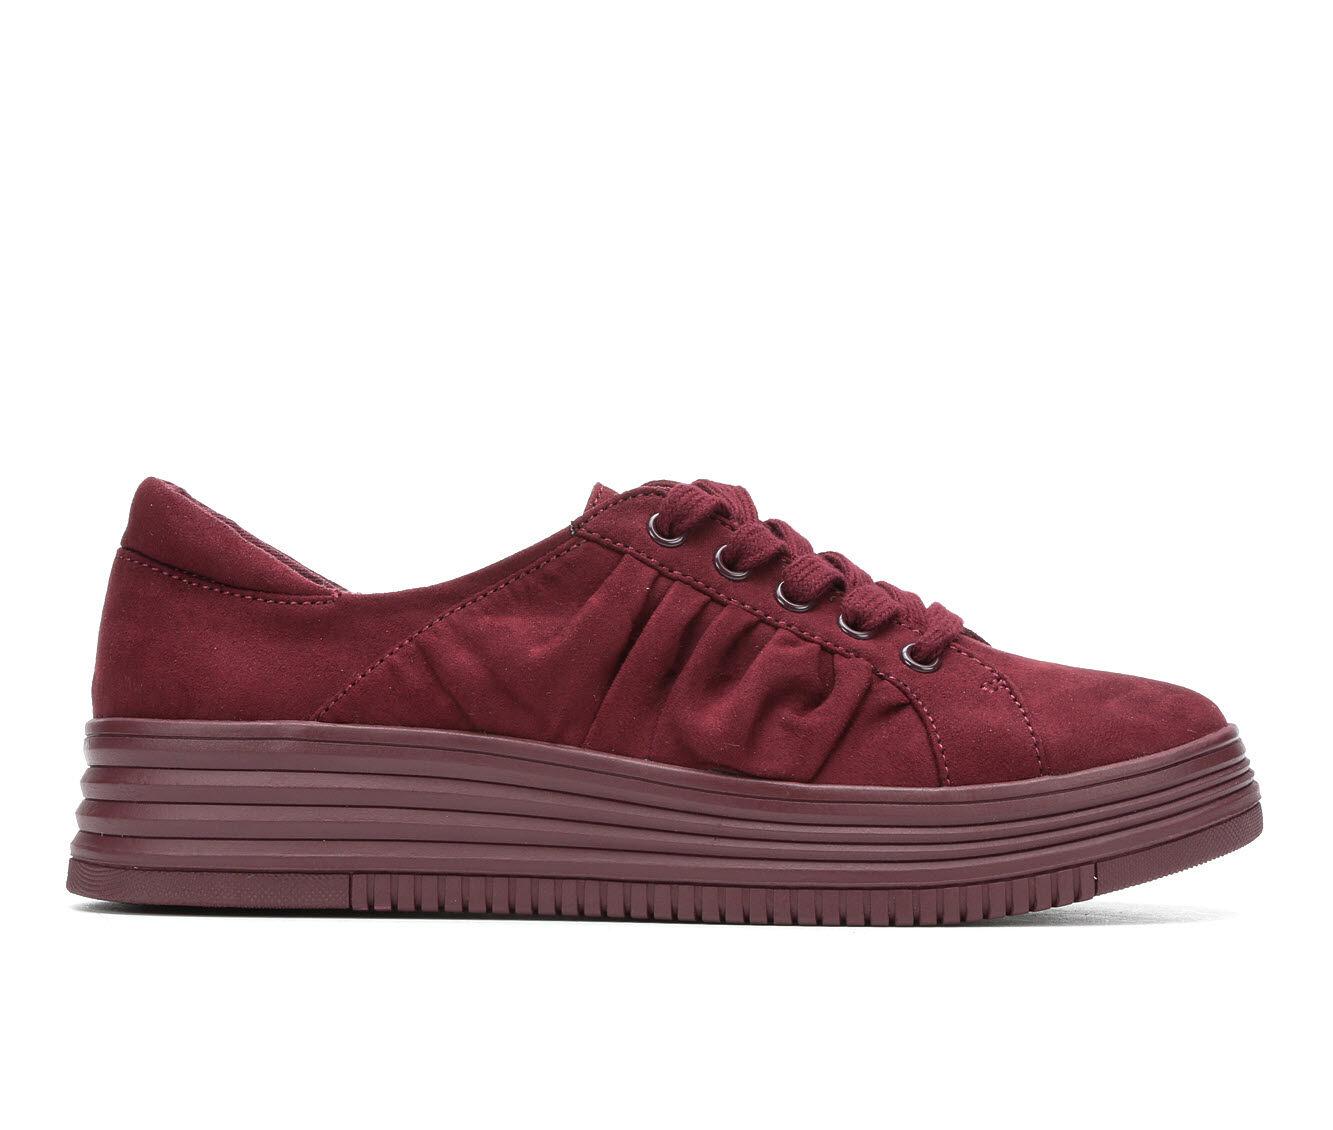 uk shoes_kd4553